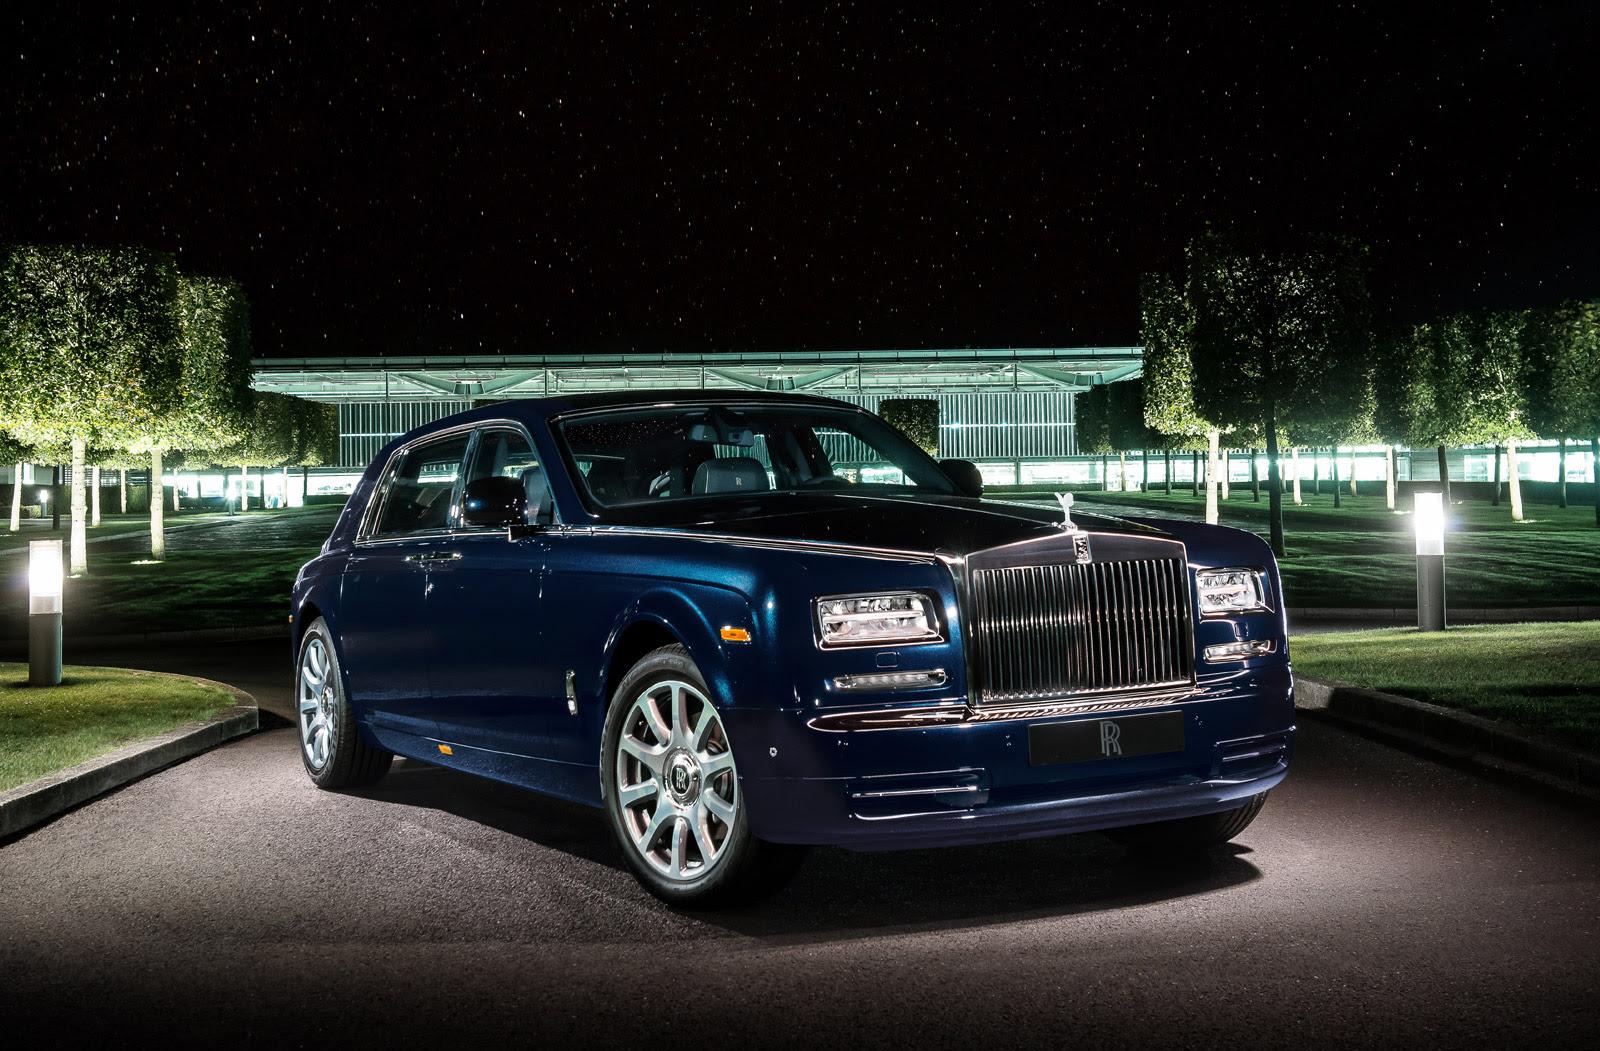 Diamond-Studded Rolls-Royce Phantom Shines At Dubai Motor Show